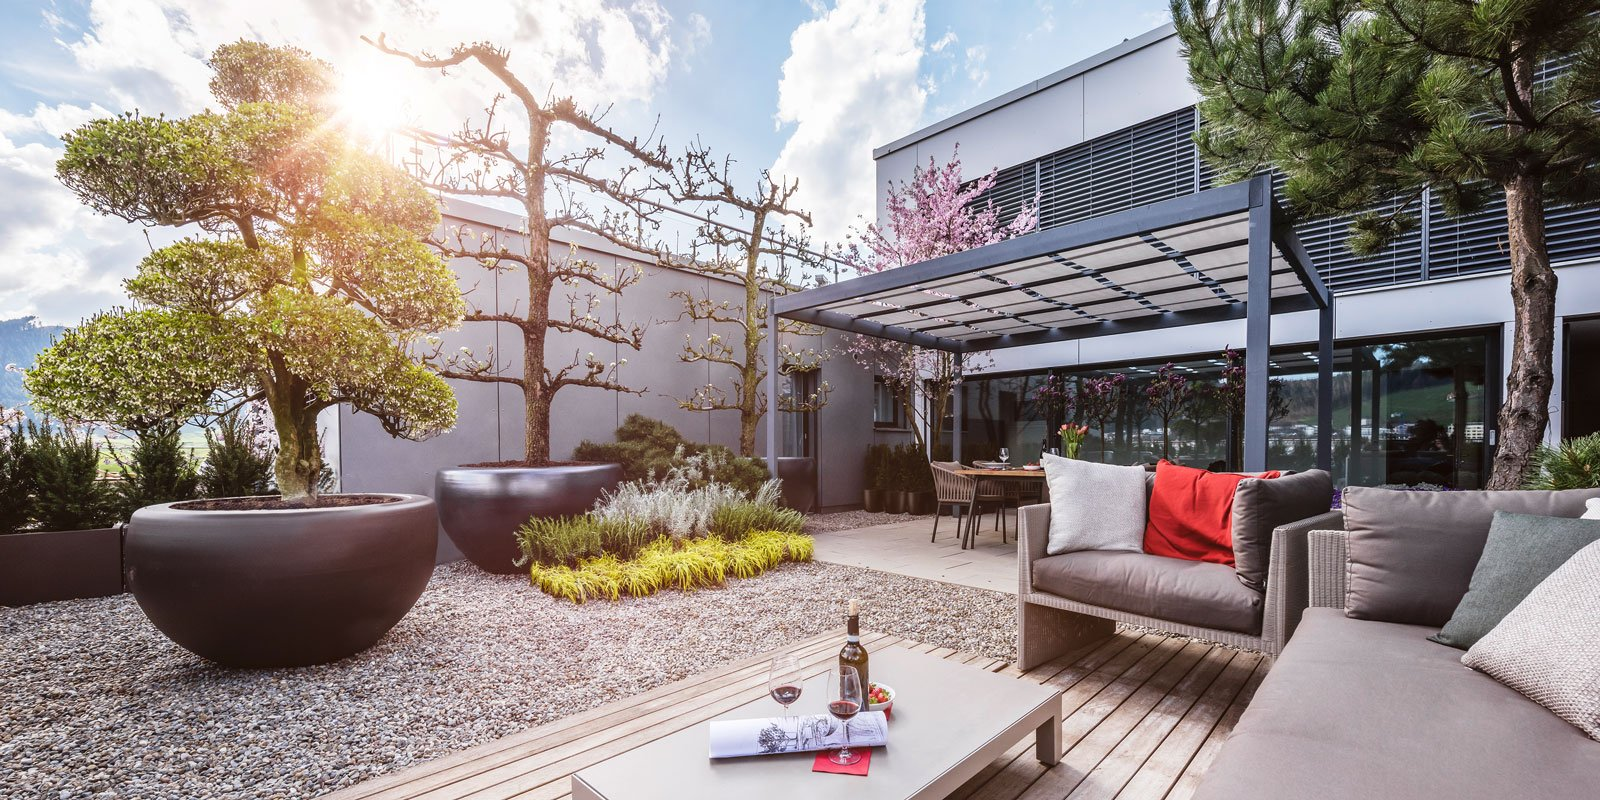 Metallico | Luca Lifestyle, Exclusieve plantenbakken